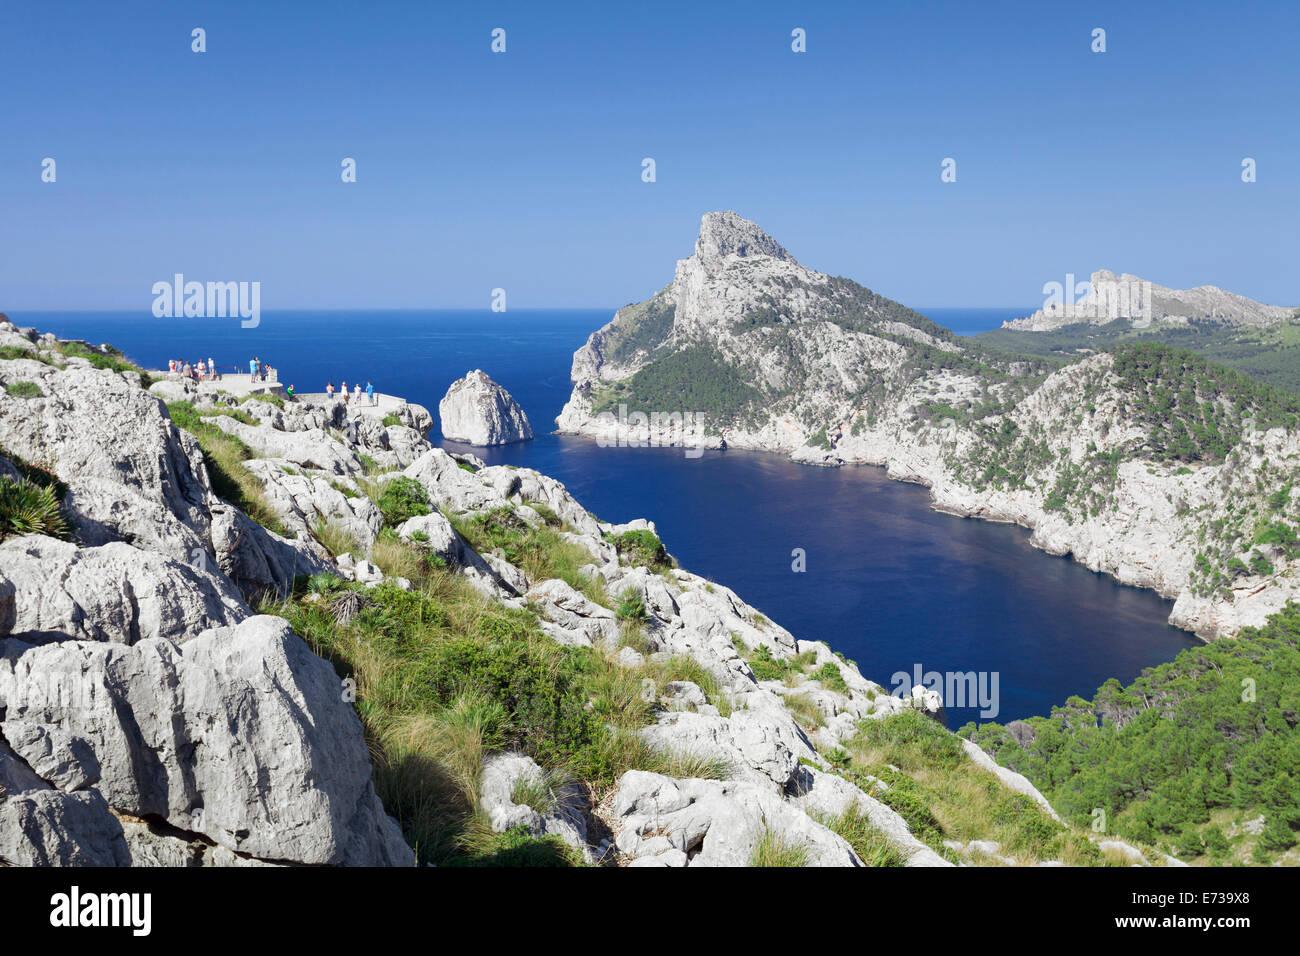 Viewpoint  Mirador d' Es Colomer, Cap de Formentor, Cape Formentor, Majorca (Mallorca), Balearic Islands (Islas - Stock Image